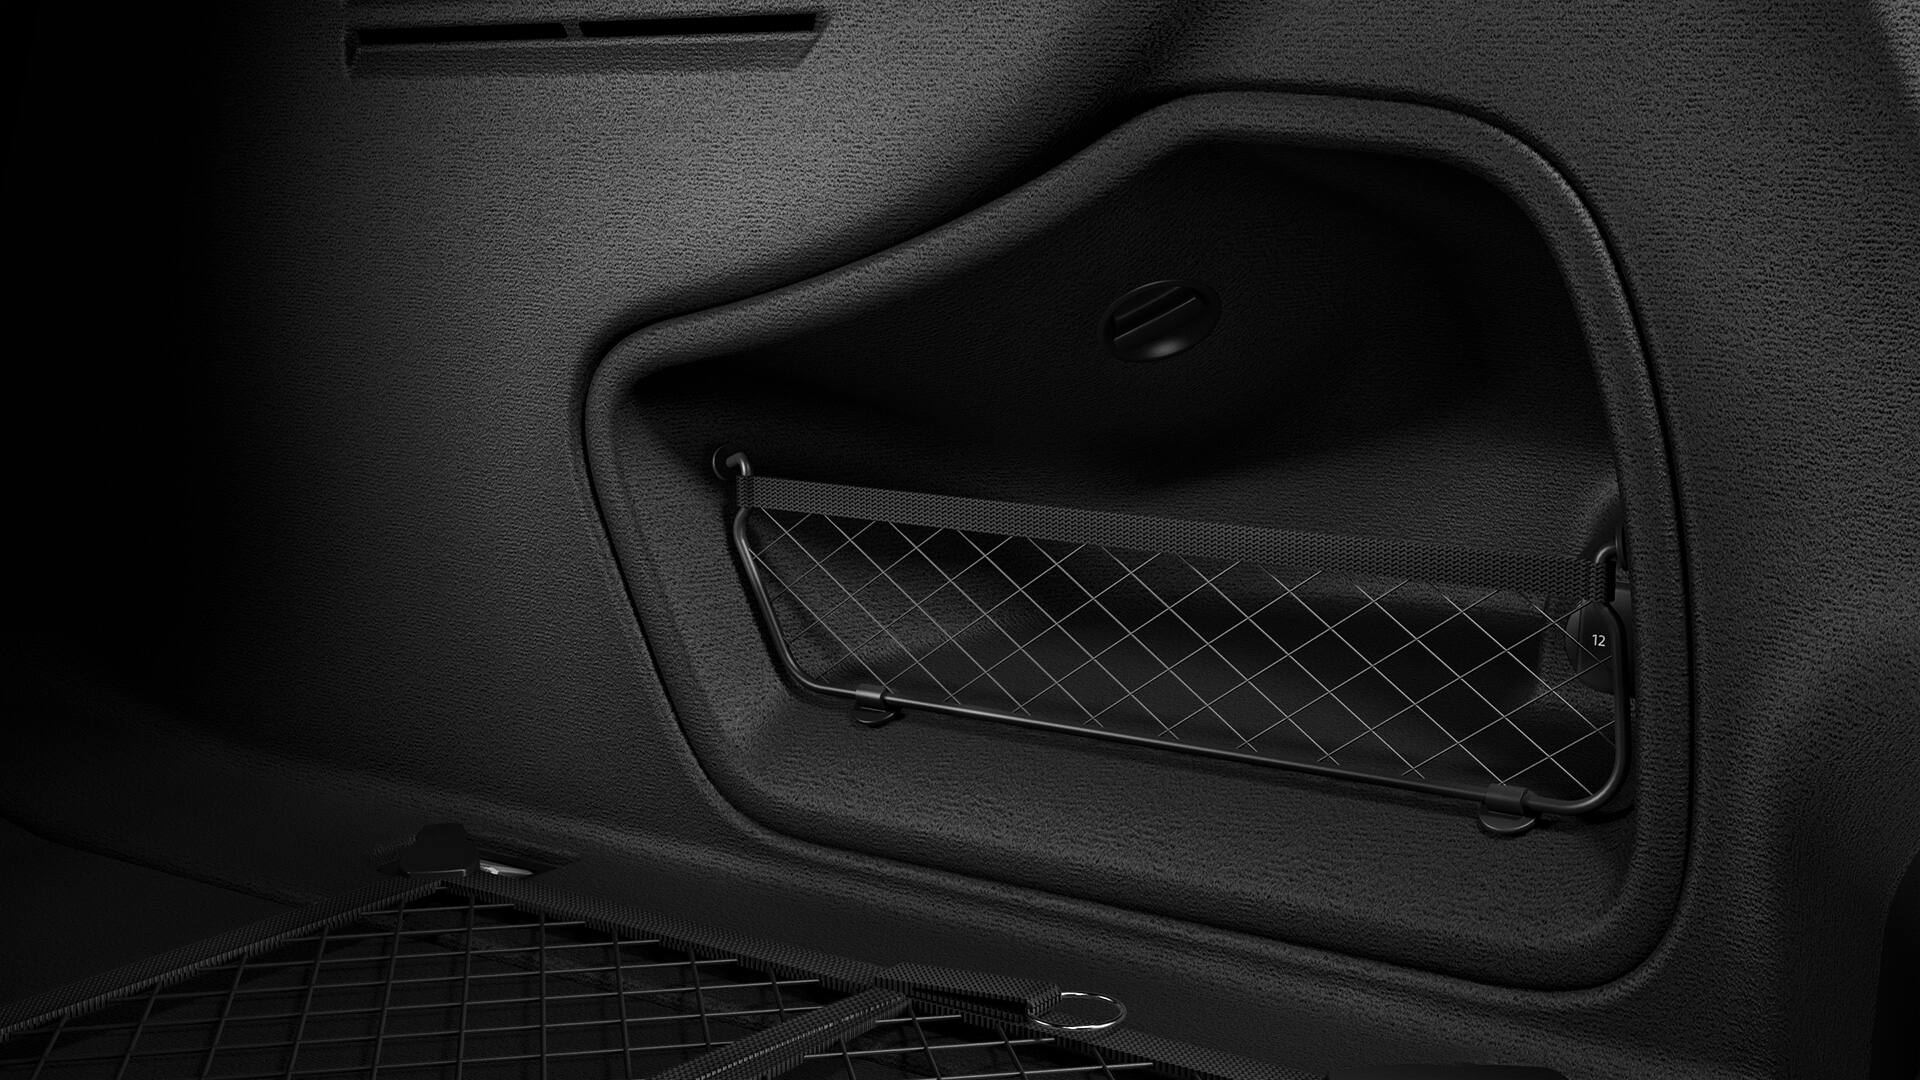 a4 limousine 2018 a4 audi deutschland. Black Bedroom Furniture Sets. Home Design Ideas